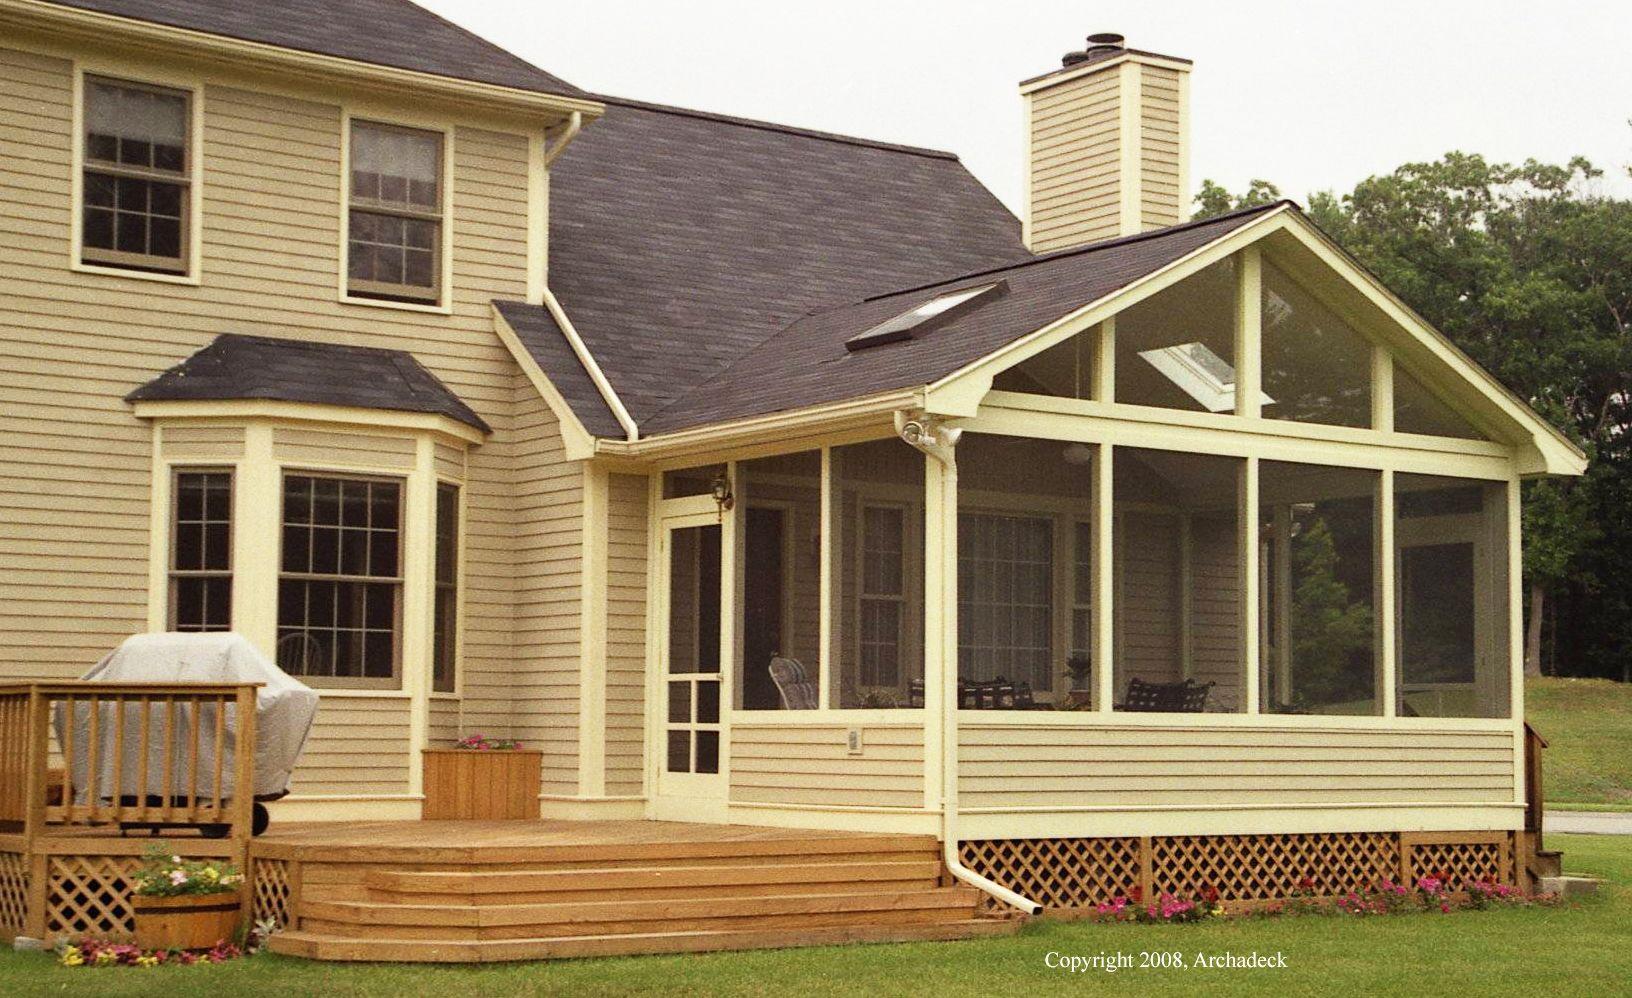 Suburban Boston Decks And Porches Blog Screened In Patio Screened In Porch Plans Porch Plans